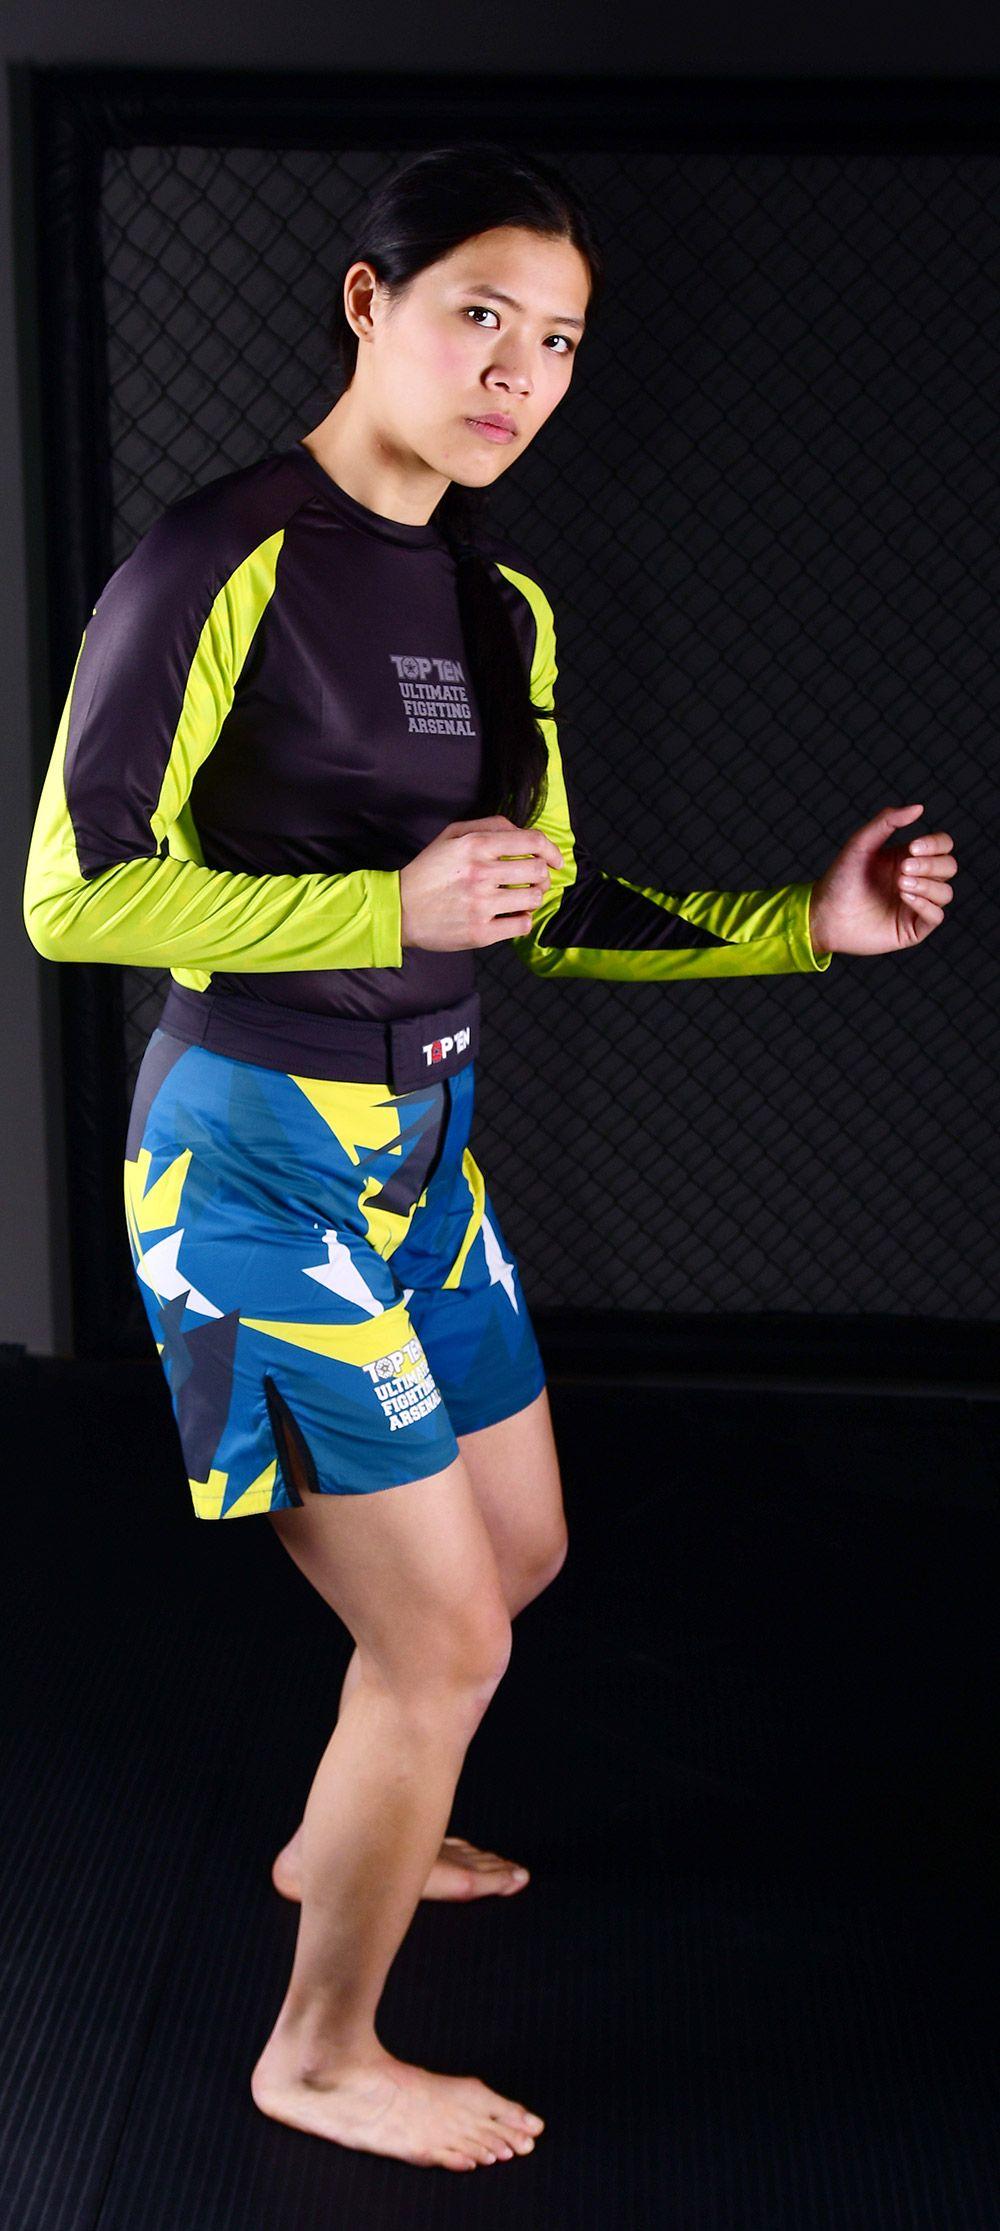 Top Ten Mma Shorts Jungle Blue Black Yellow In 2020 Mma Shorts Black N Yellow Mma